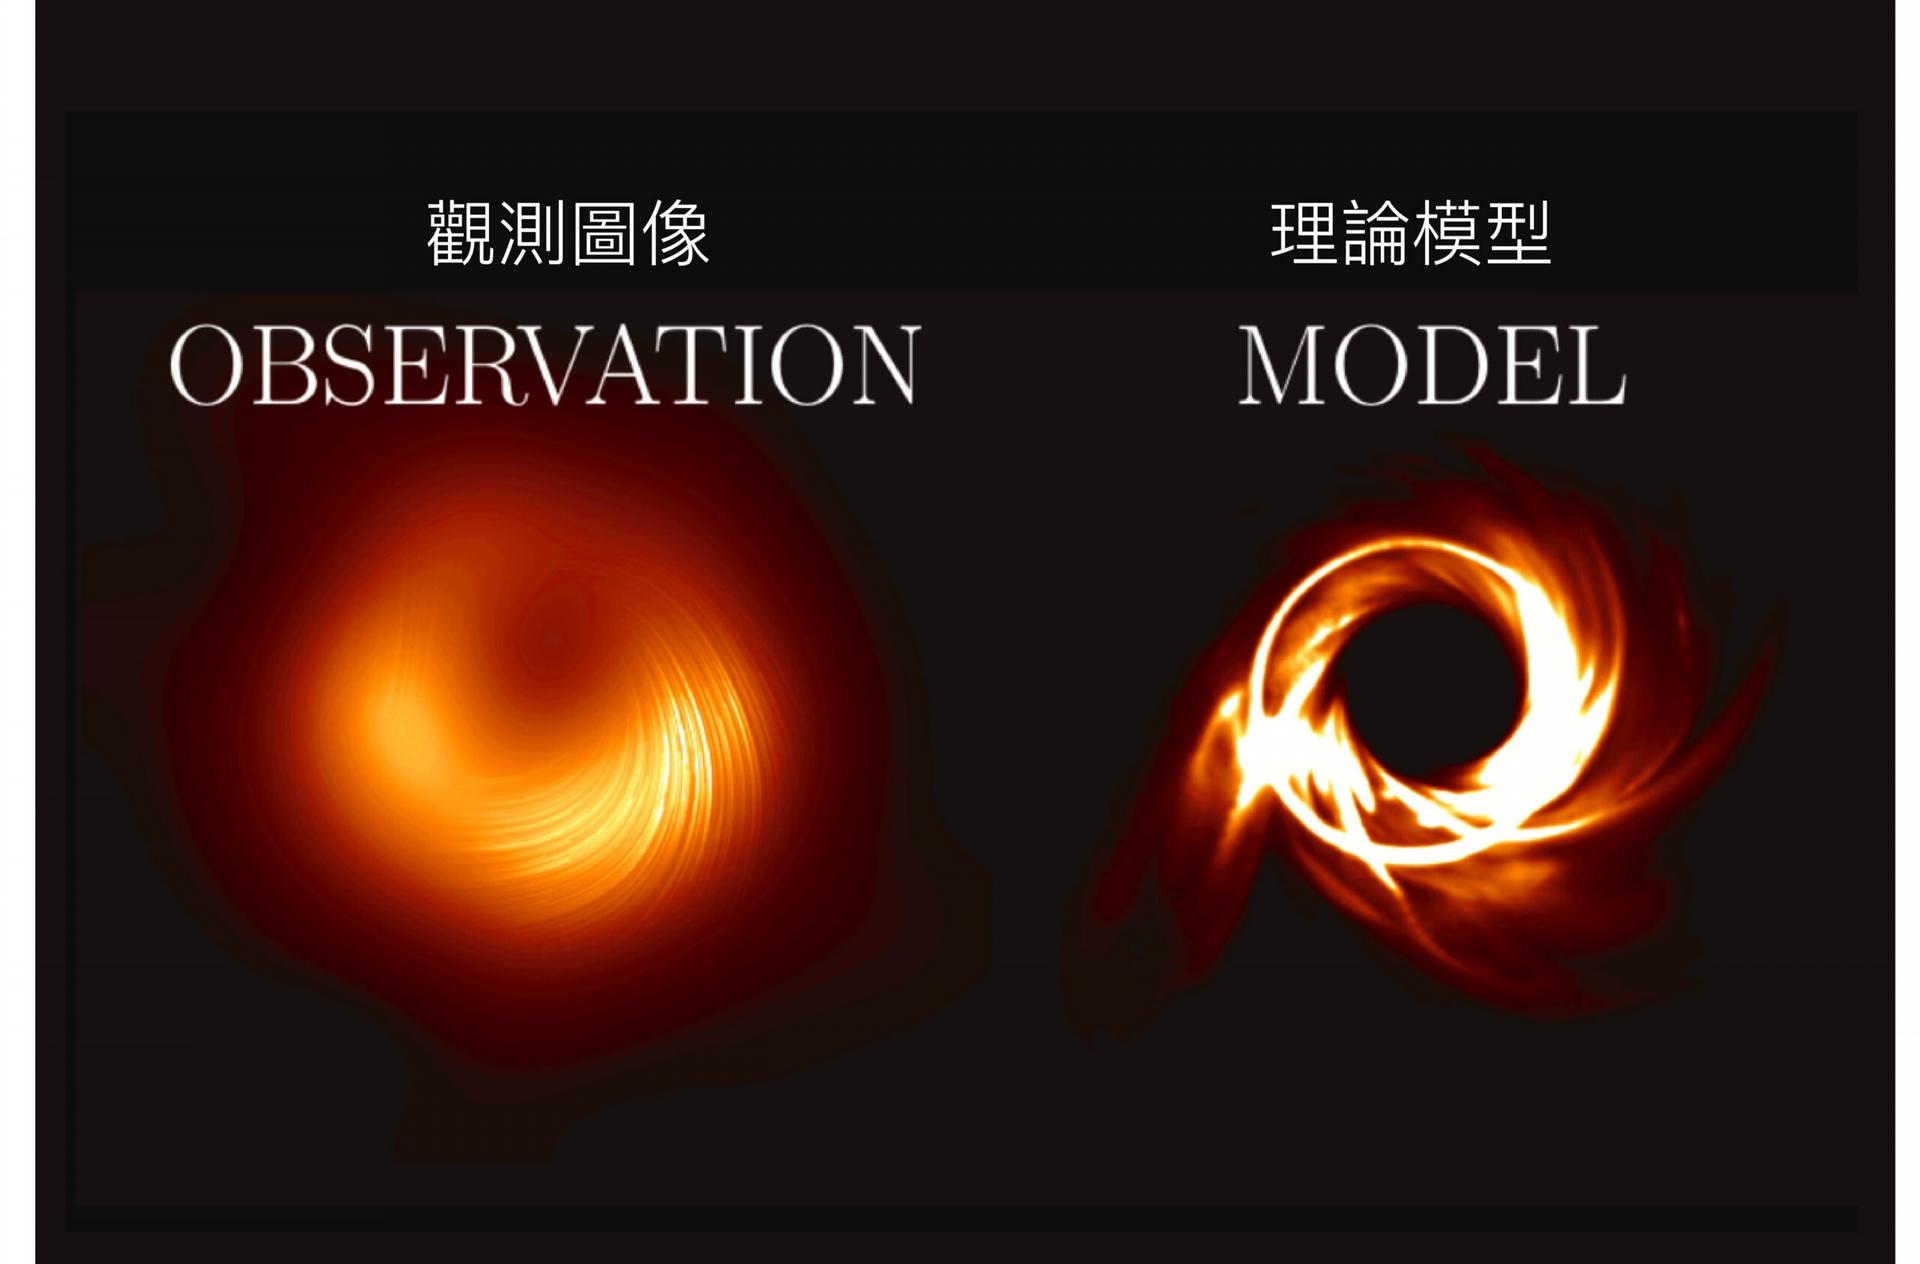 M87 黑洞觀測影像與理論模型比較,可預期未來觀測解析度提高之後,有機會看到更多細緻的結構。 資料來源│S. Issaoun, M. Mościbrodzka with Polarimetry WG and OWG